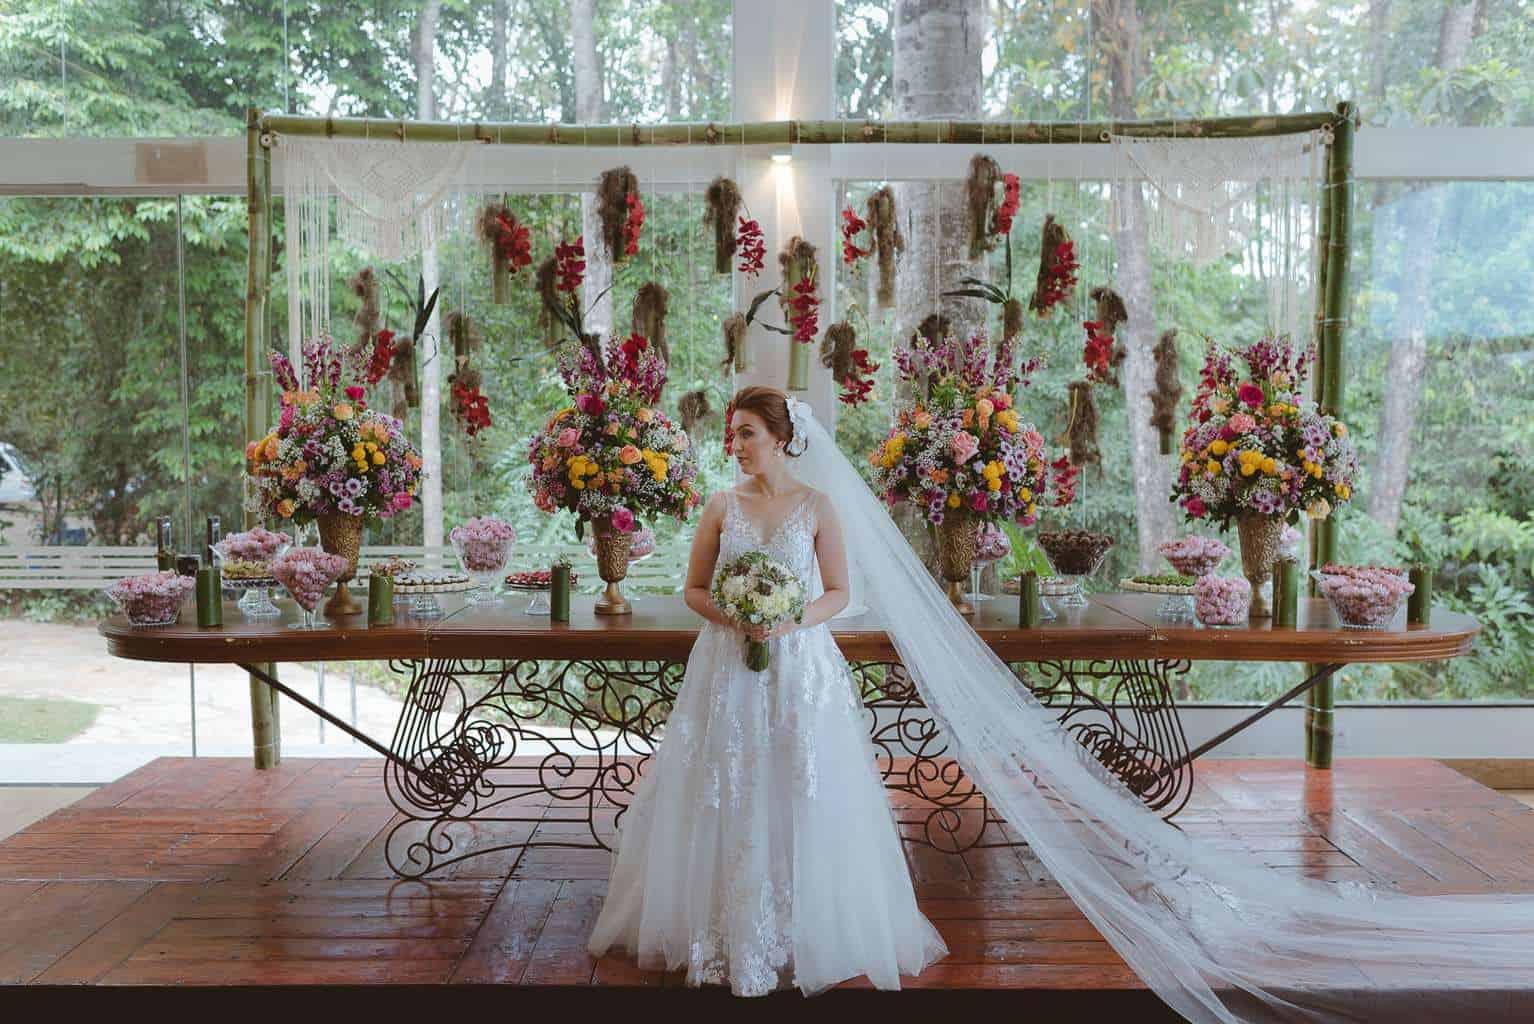 casamento-ao-ar-livre-casamento-boho-casamento-geek-casamento-rustico-casamento-Thais-e-Pedro-noiva-Revoar-Fotografia-Villa-Borghese-Eventos-54